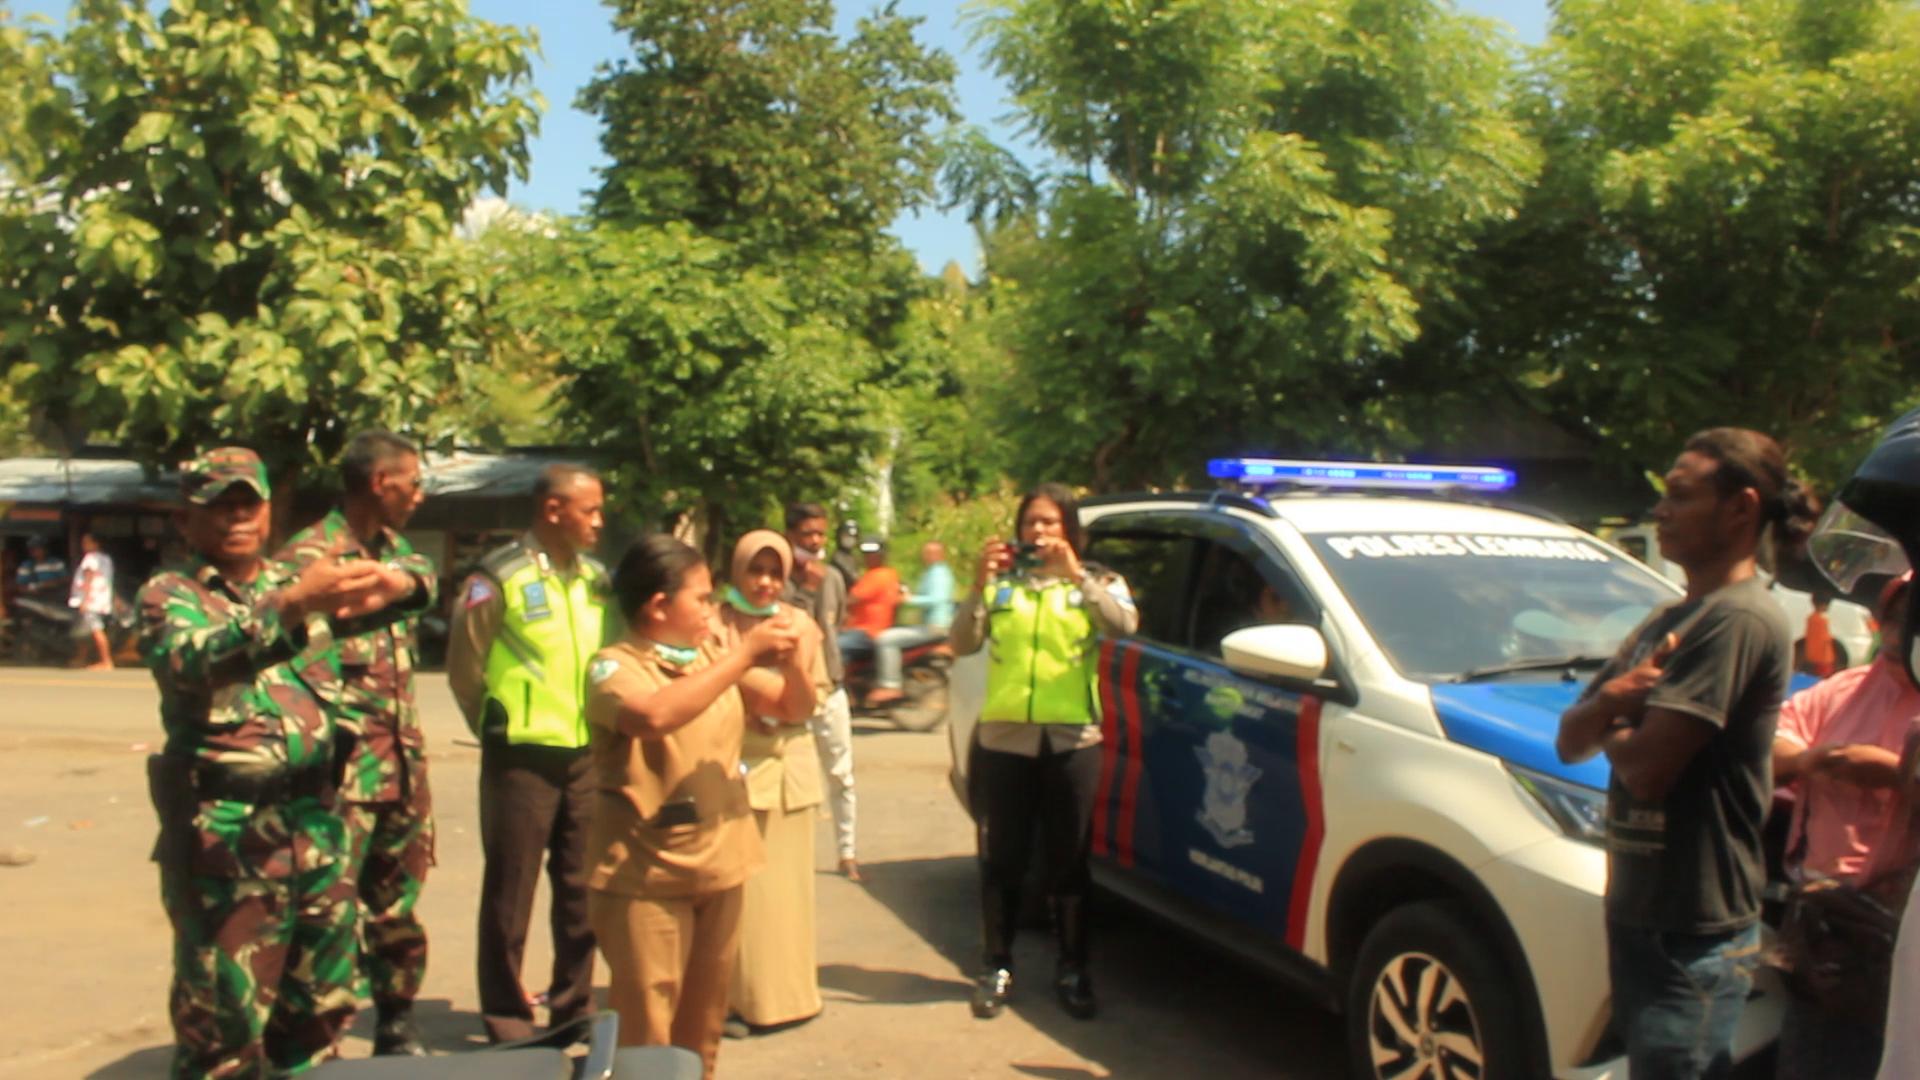 Tni Polri Gandeng Dinas Kesehatan Kabupaten Lembata, Menyampaikan Penekanan Dan Sosialisasi Kepada Warga Masyarakat